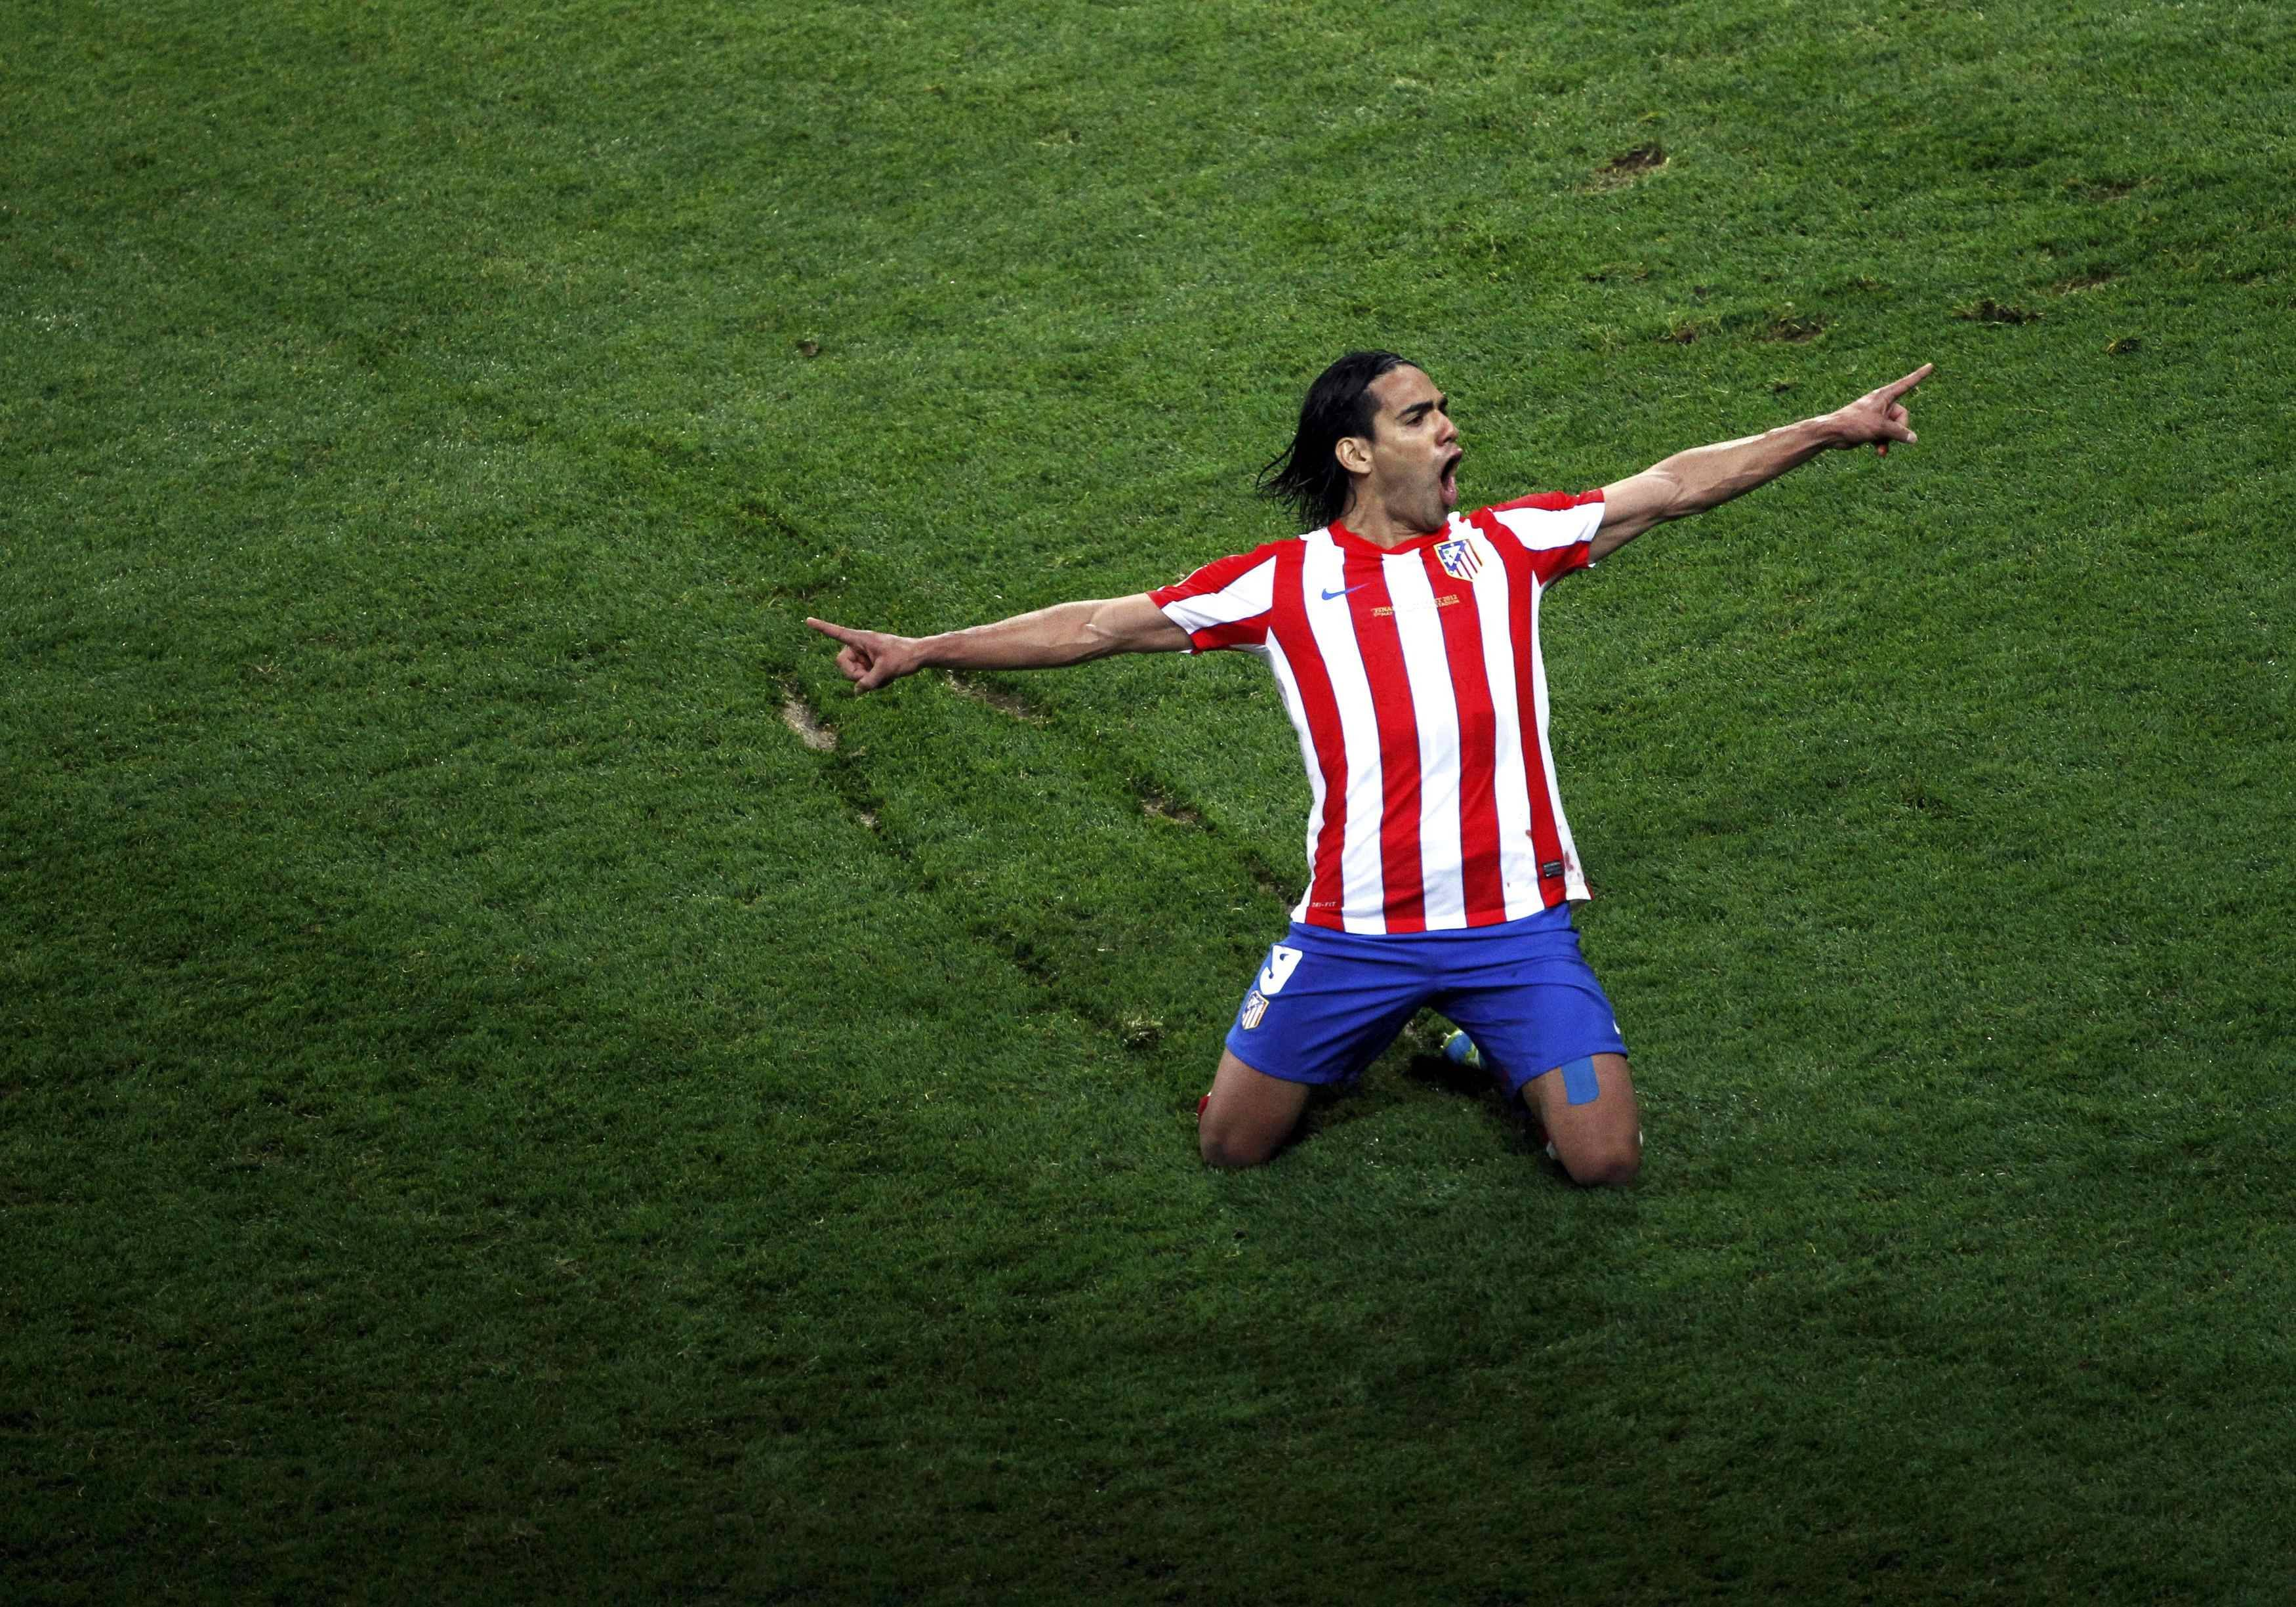 Radamel Falcao Atletico Madrid 2013 HD Best Wallpaper | Football ...